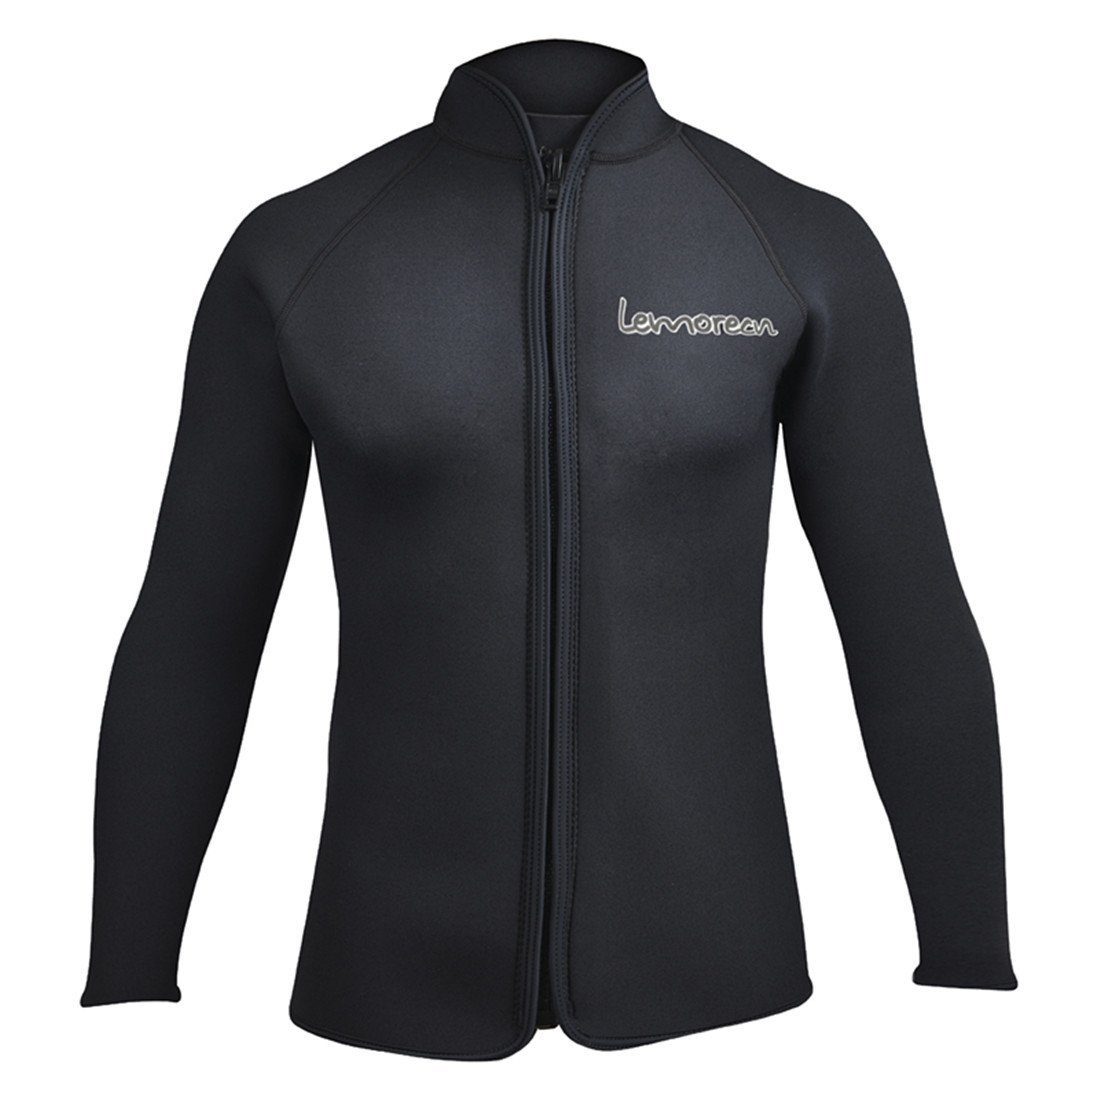 Lemorecn Adult's 3mm Wetsuits Jacket Long Sleeve Neoprene Wetsuits Top US Size (2031black-3XL) by Lemorecn